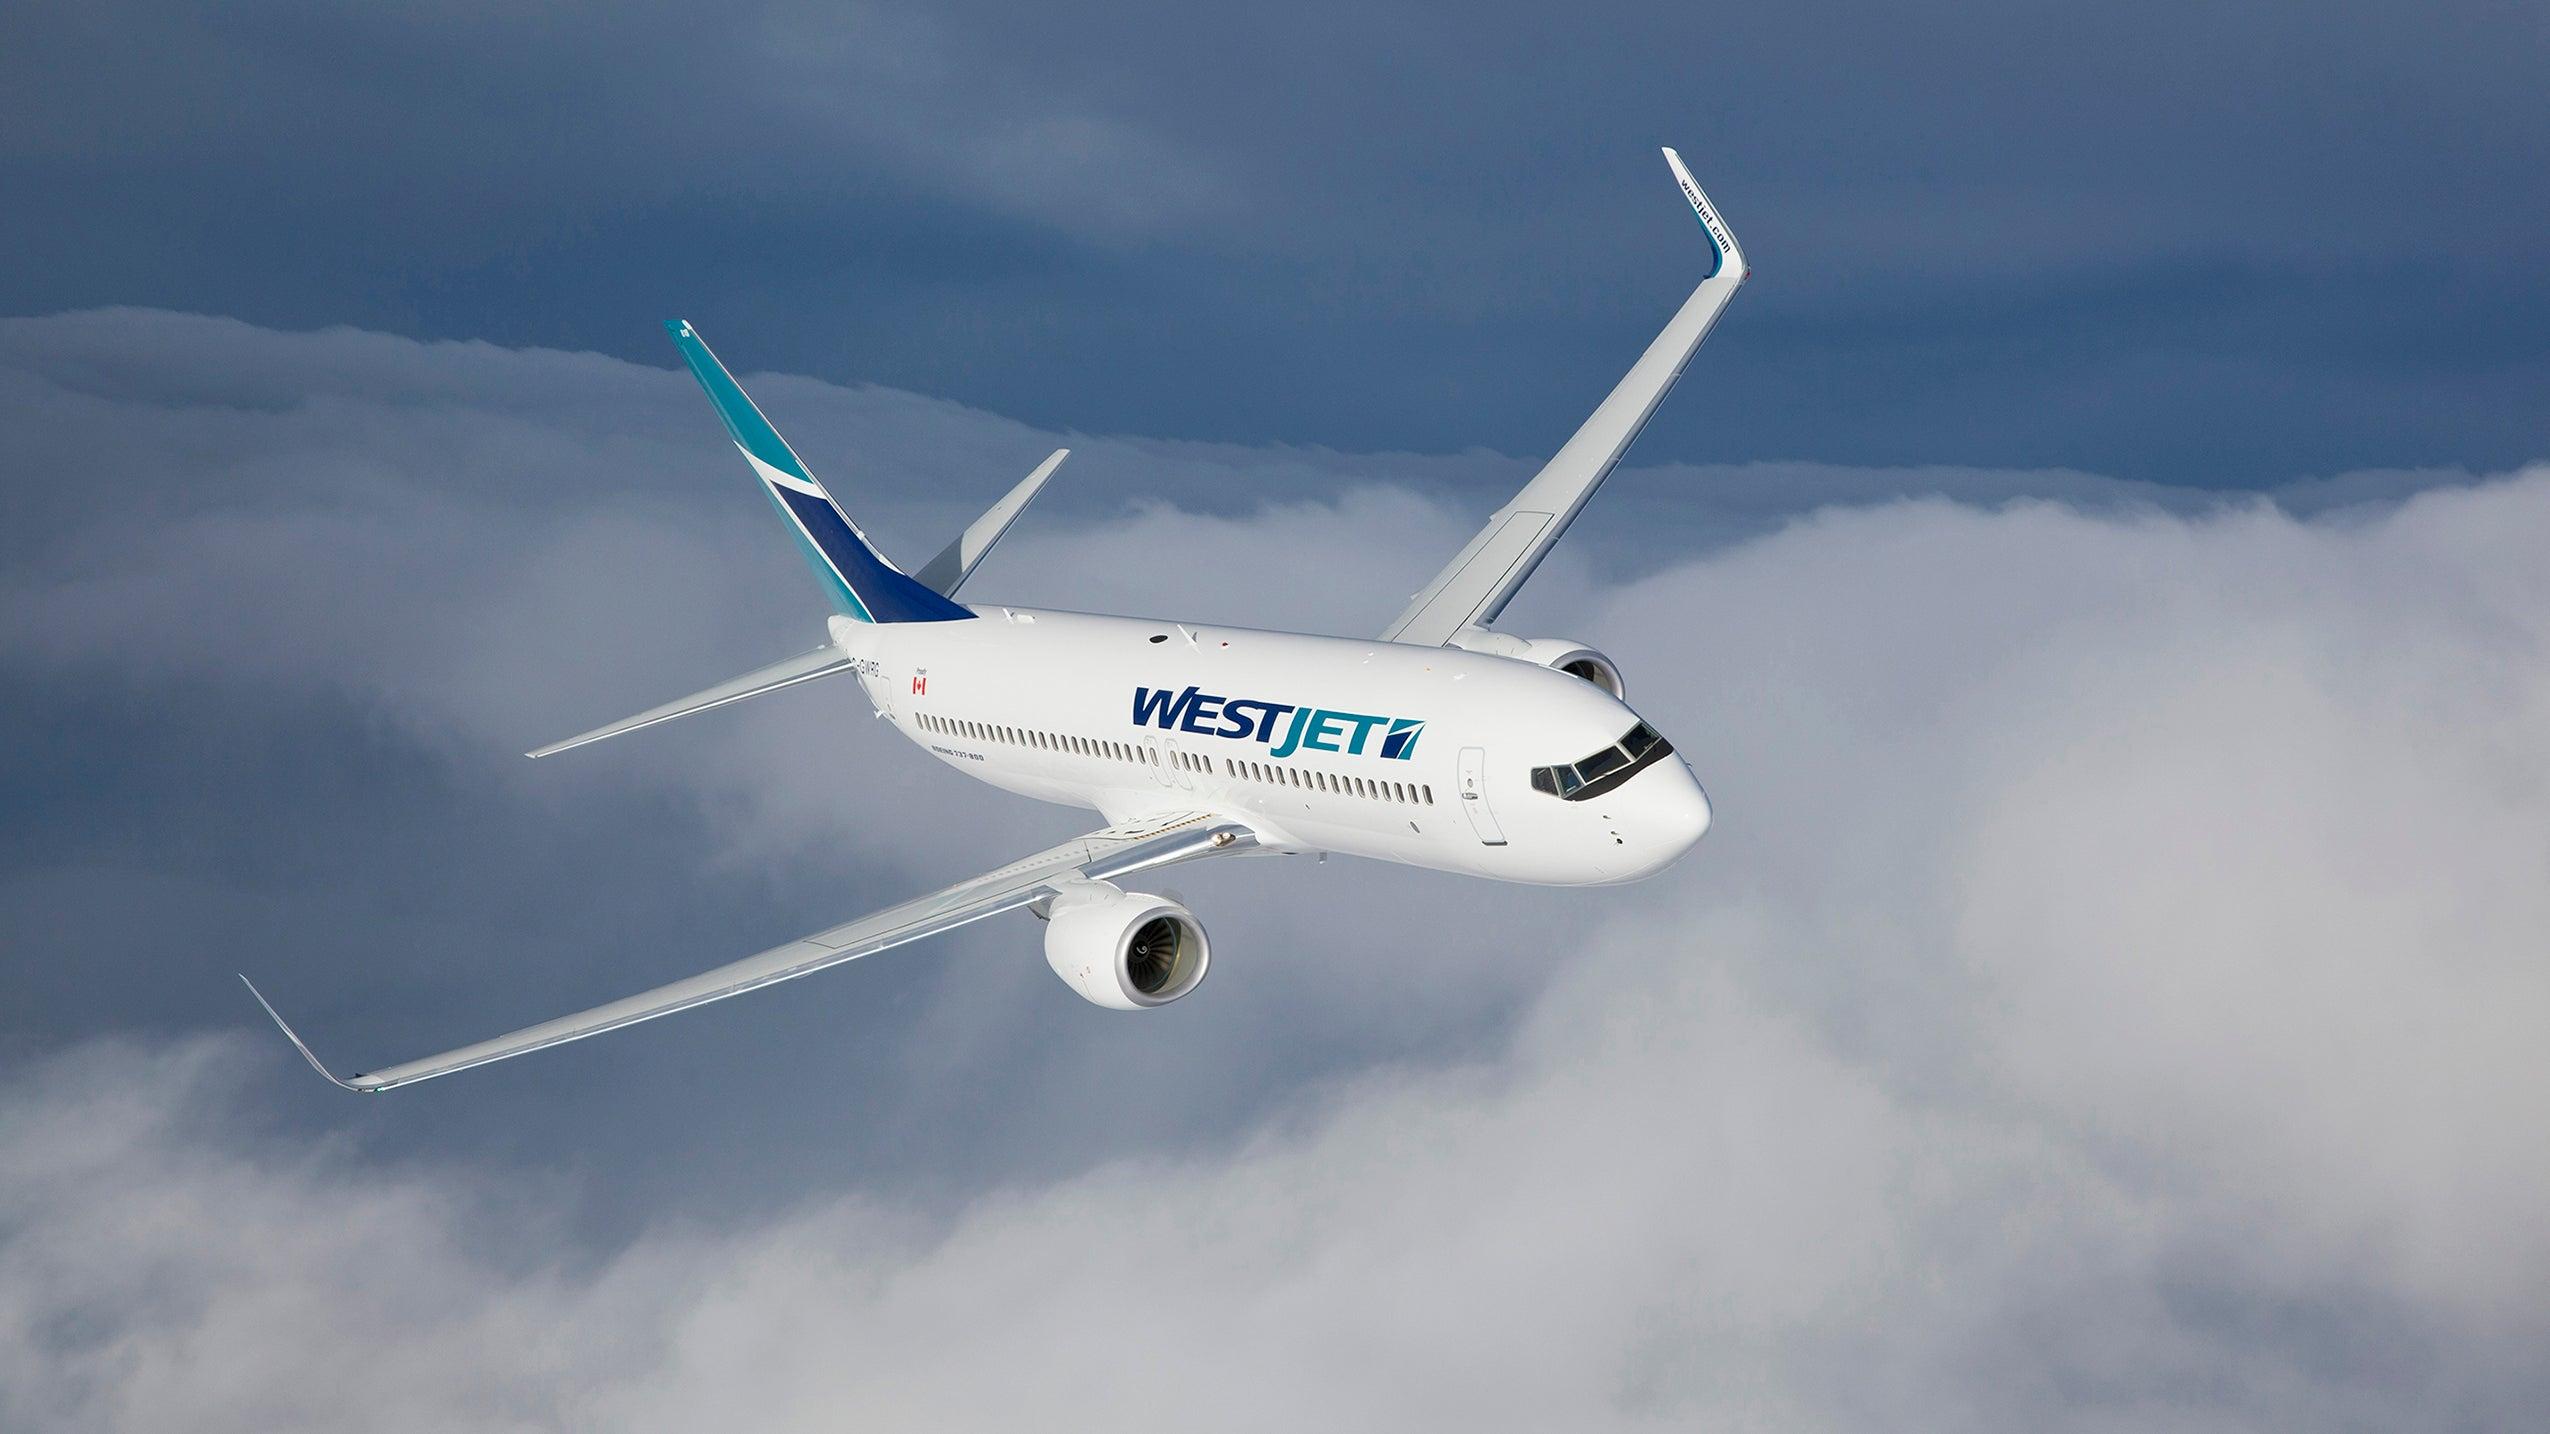 WestJet Gives Vague Updates to Strike Negotiations on Twitter